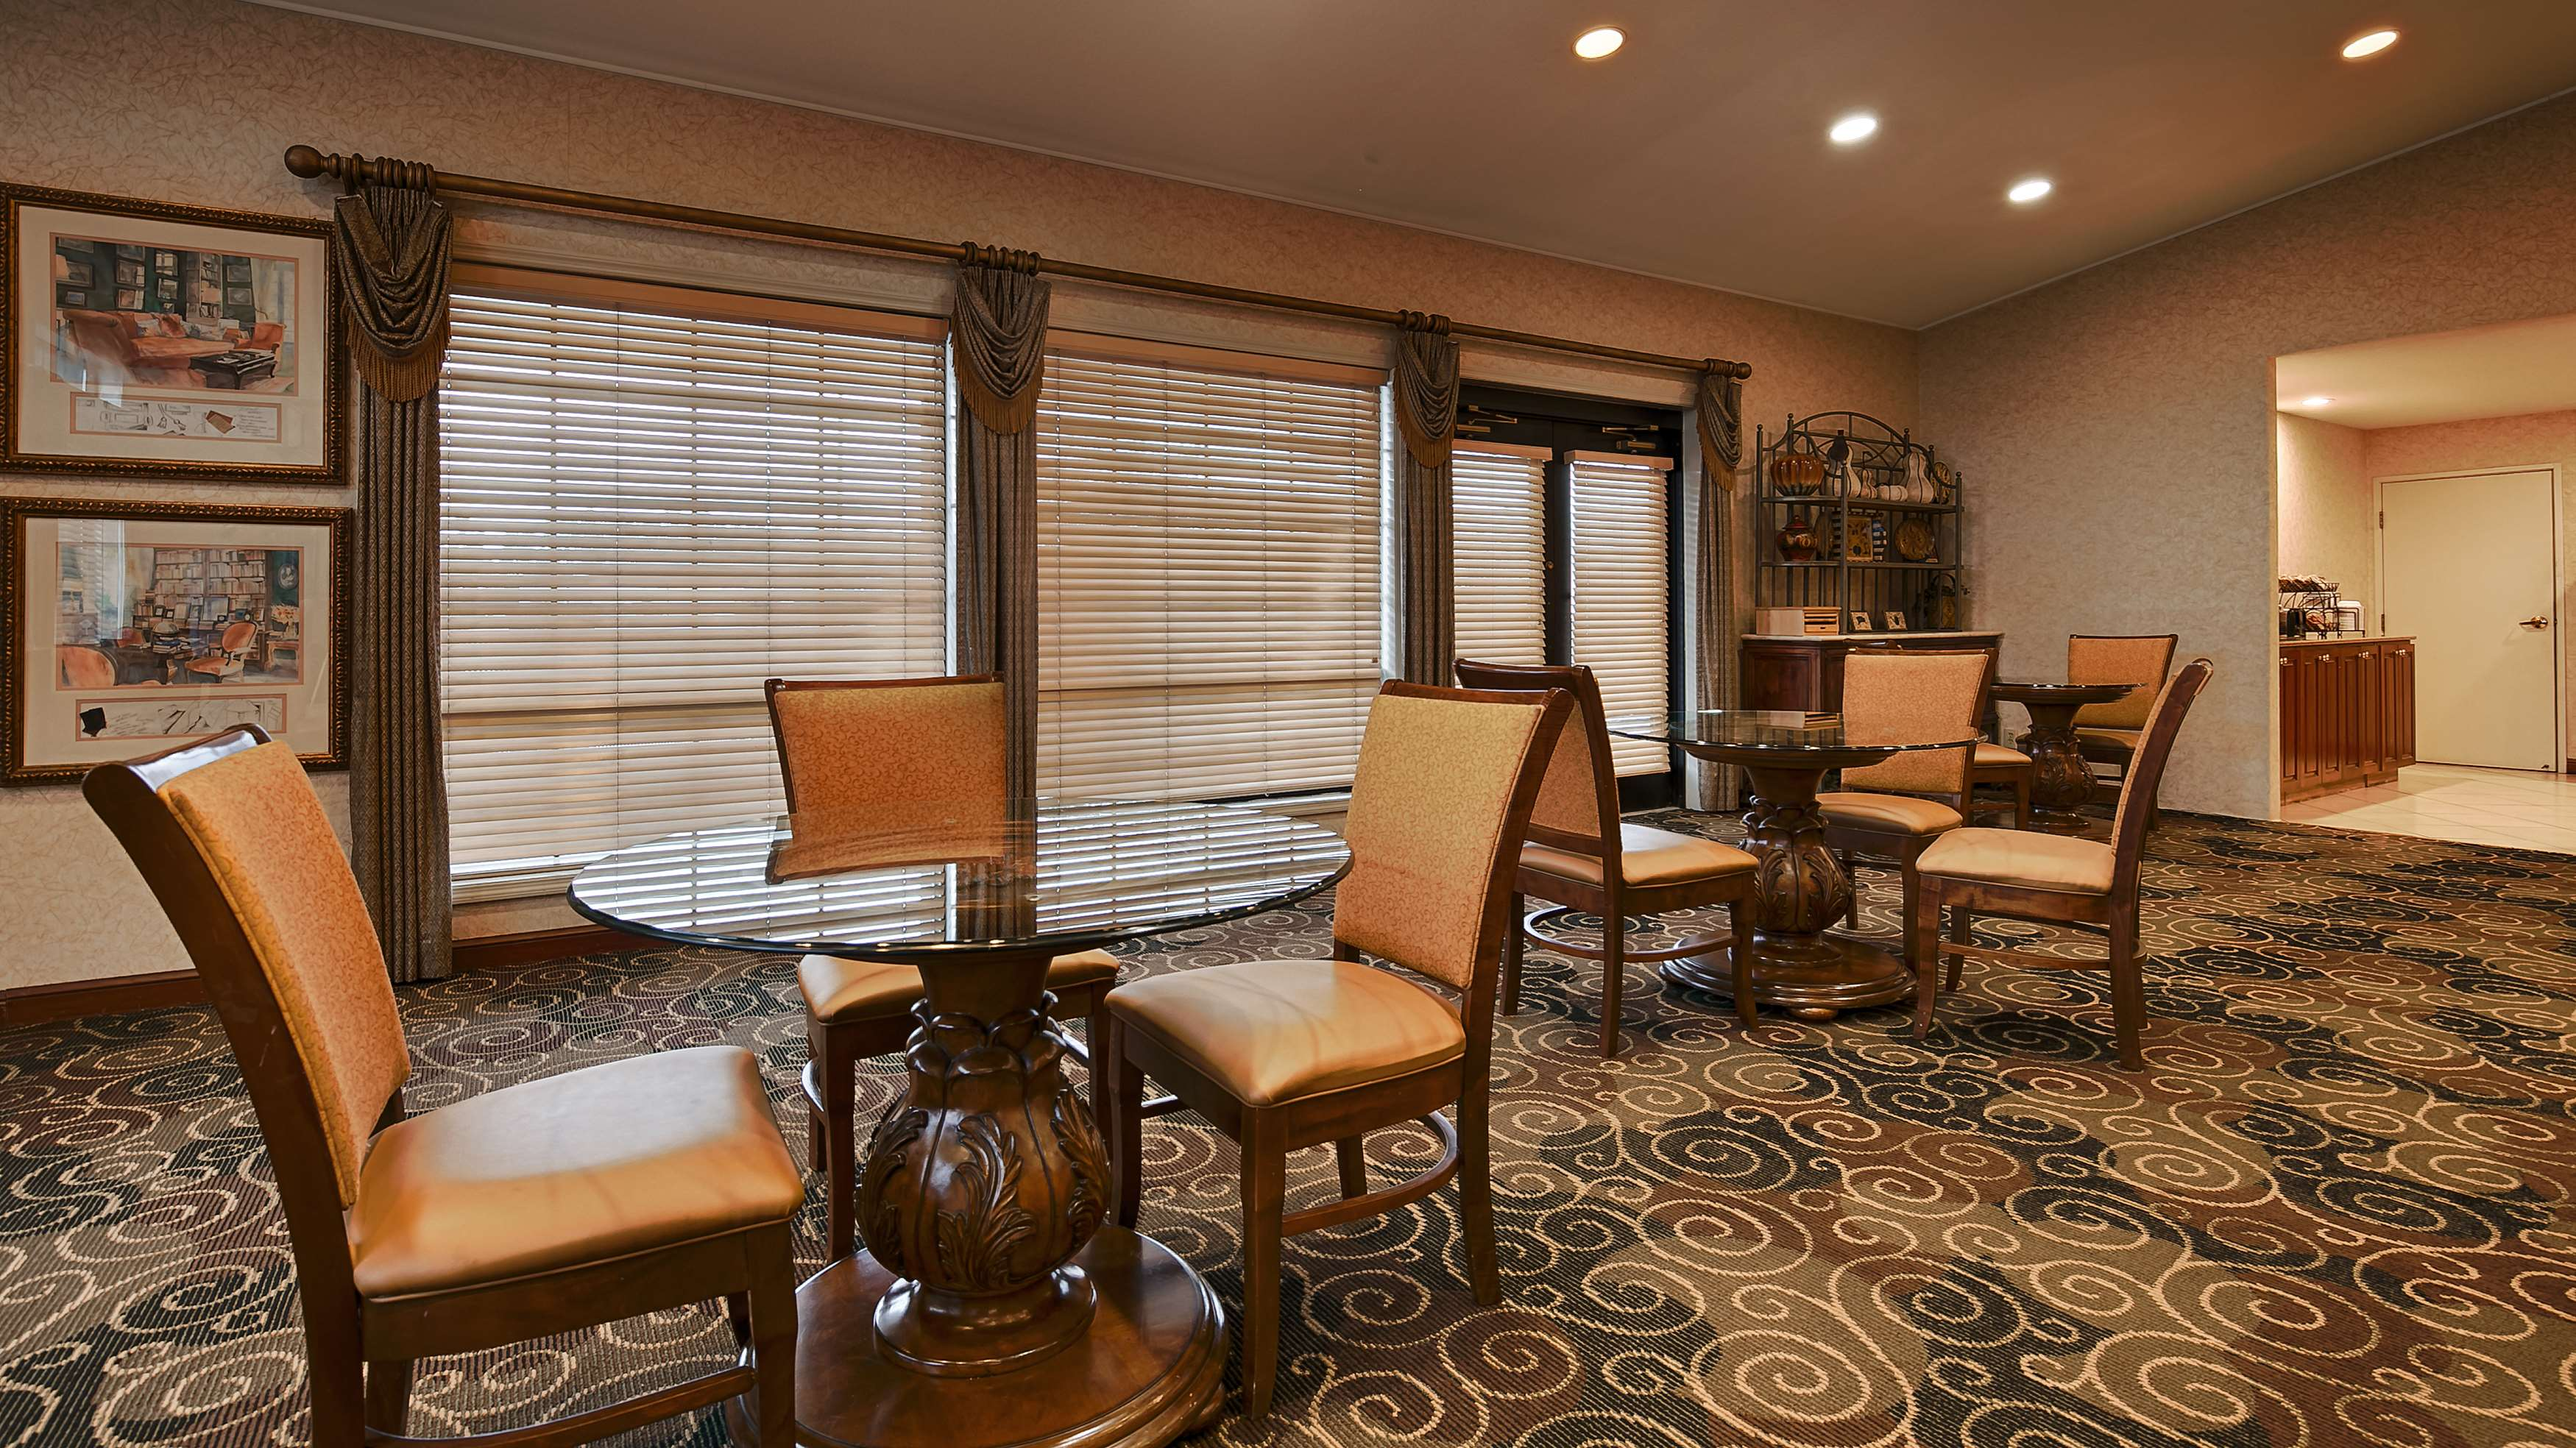 Best Western Plus Bessemer Hotel & Suites image 34